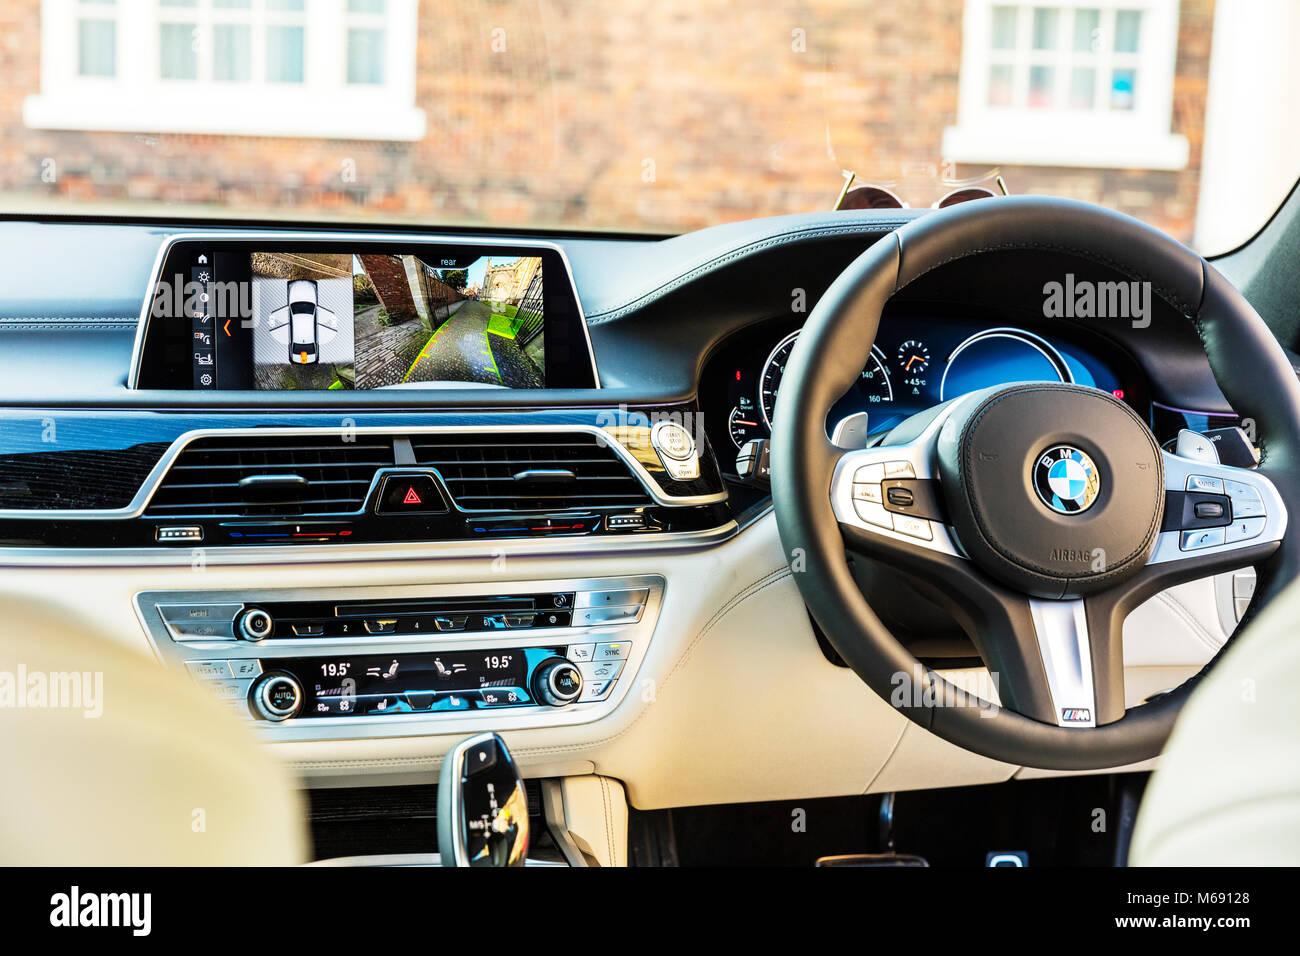 Inside new BMW 7series car, BMW 7series car interior, BMW 7series car dashboard, BMW 7series car steering wheel, - Stock Image